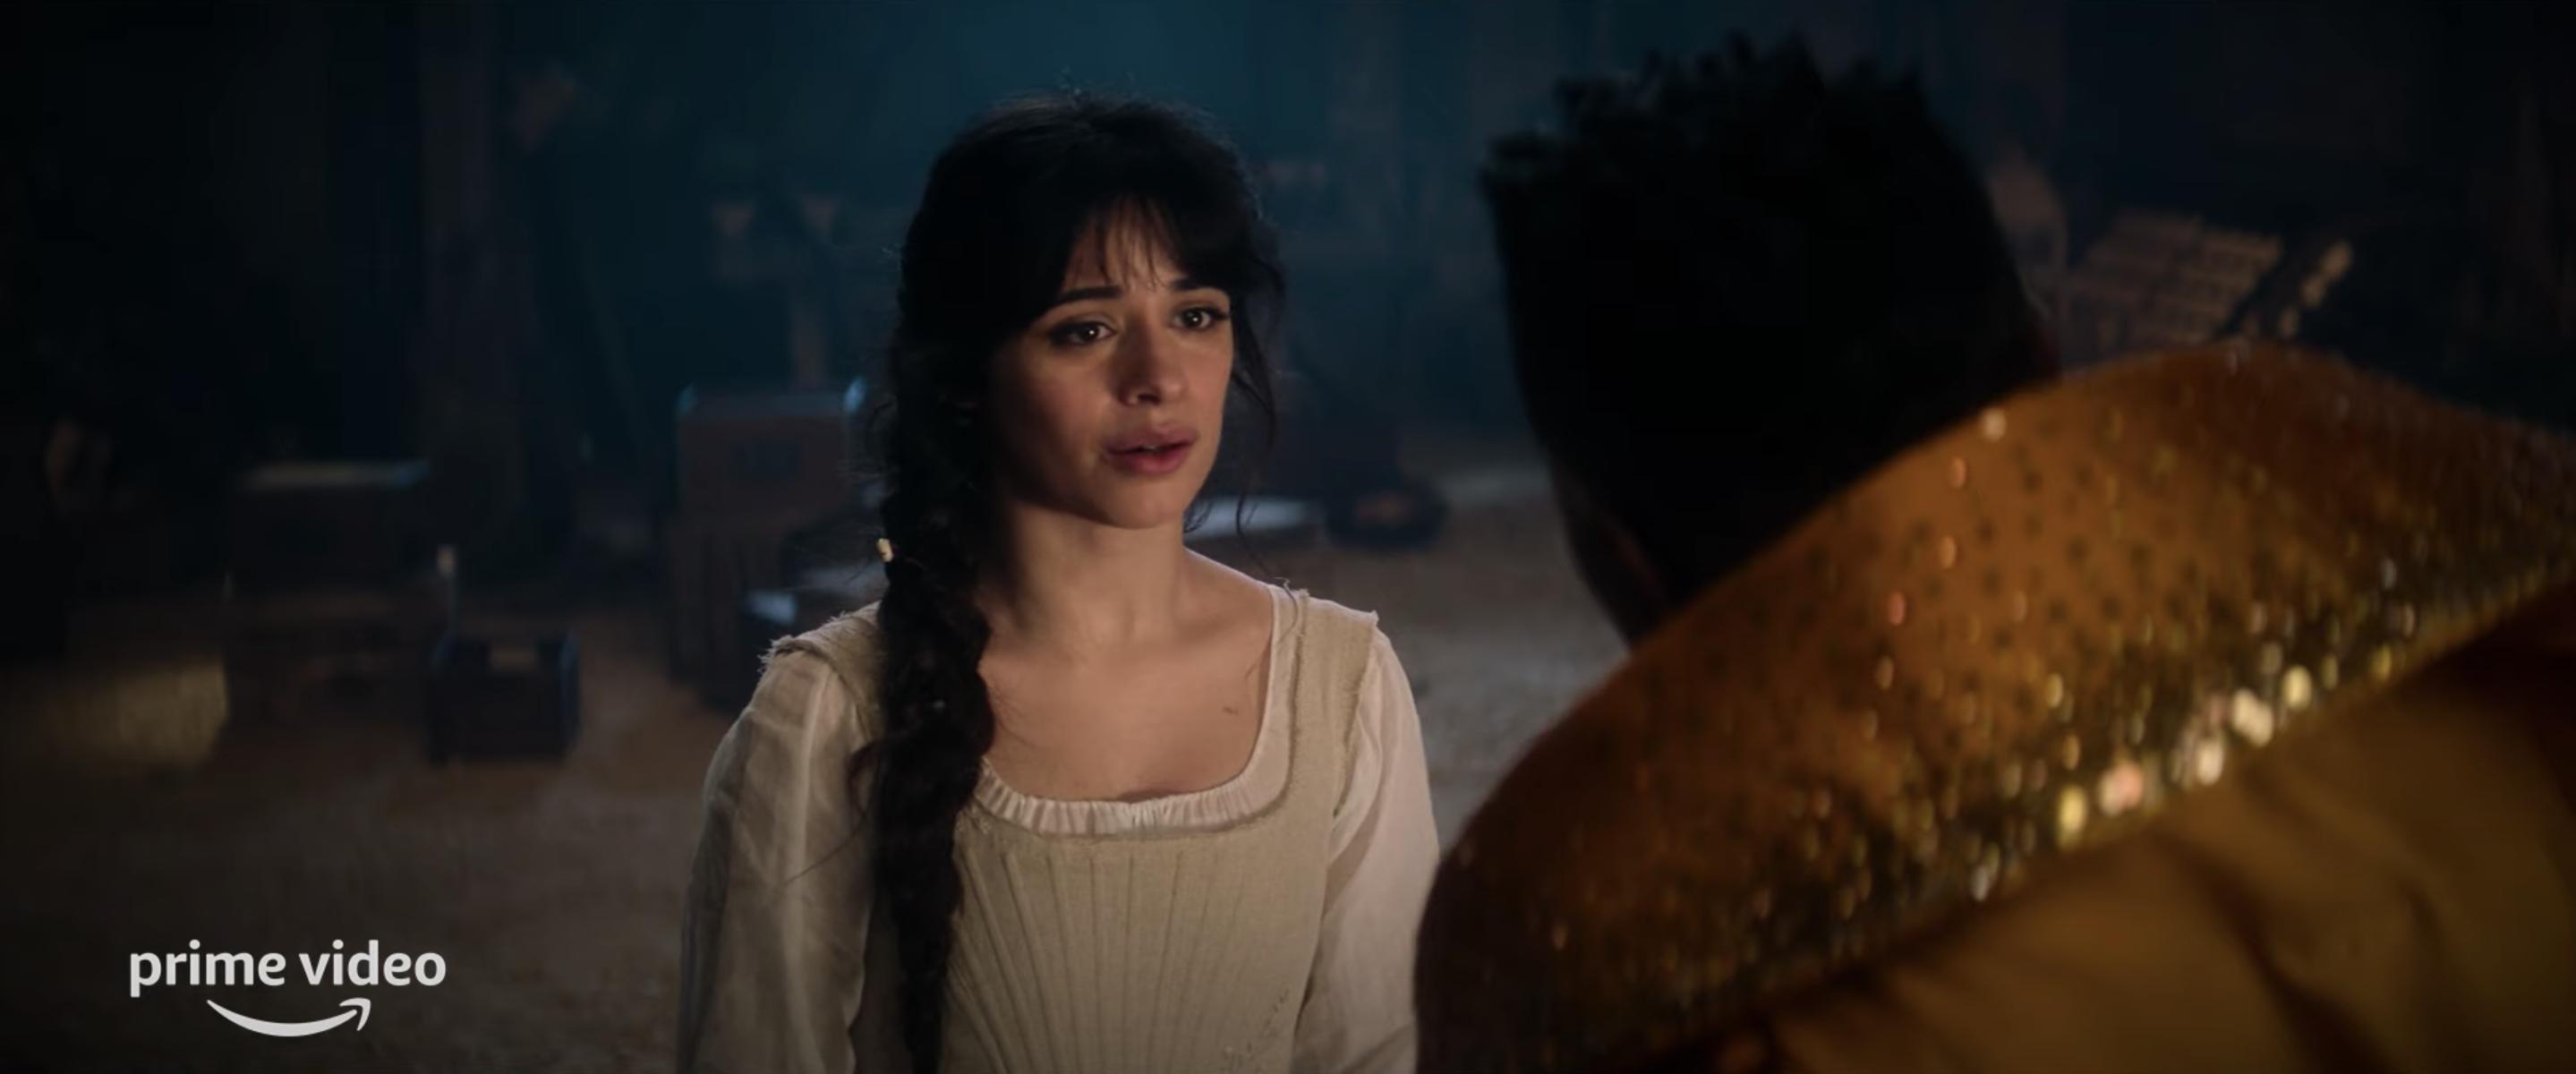 "Camila Cabello looks concerned as Cinderella on set of Amazon Prime Video's ""Cinderella"""